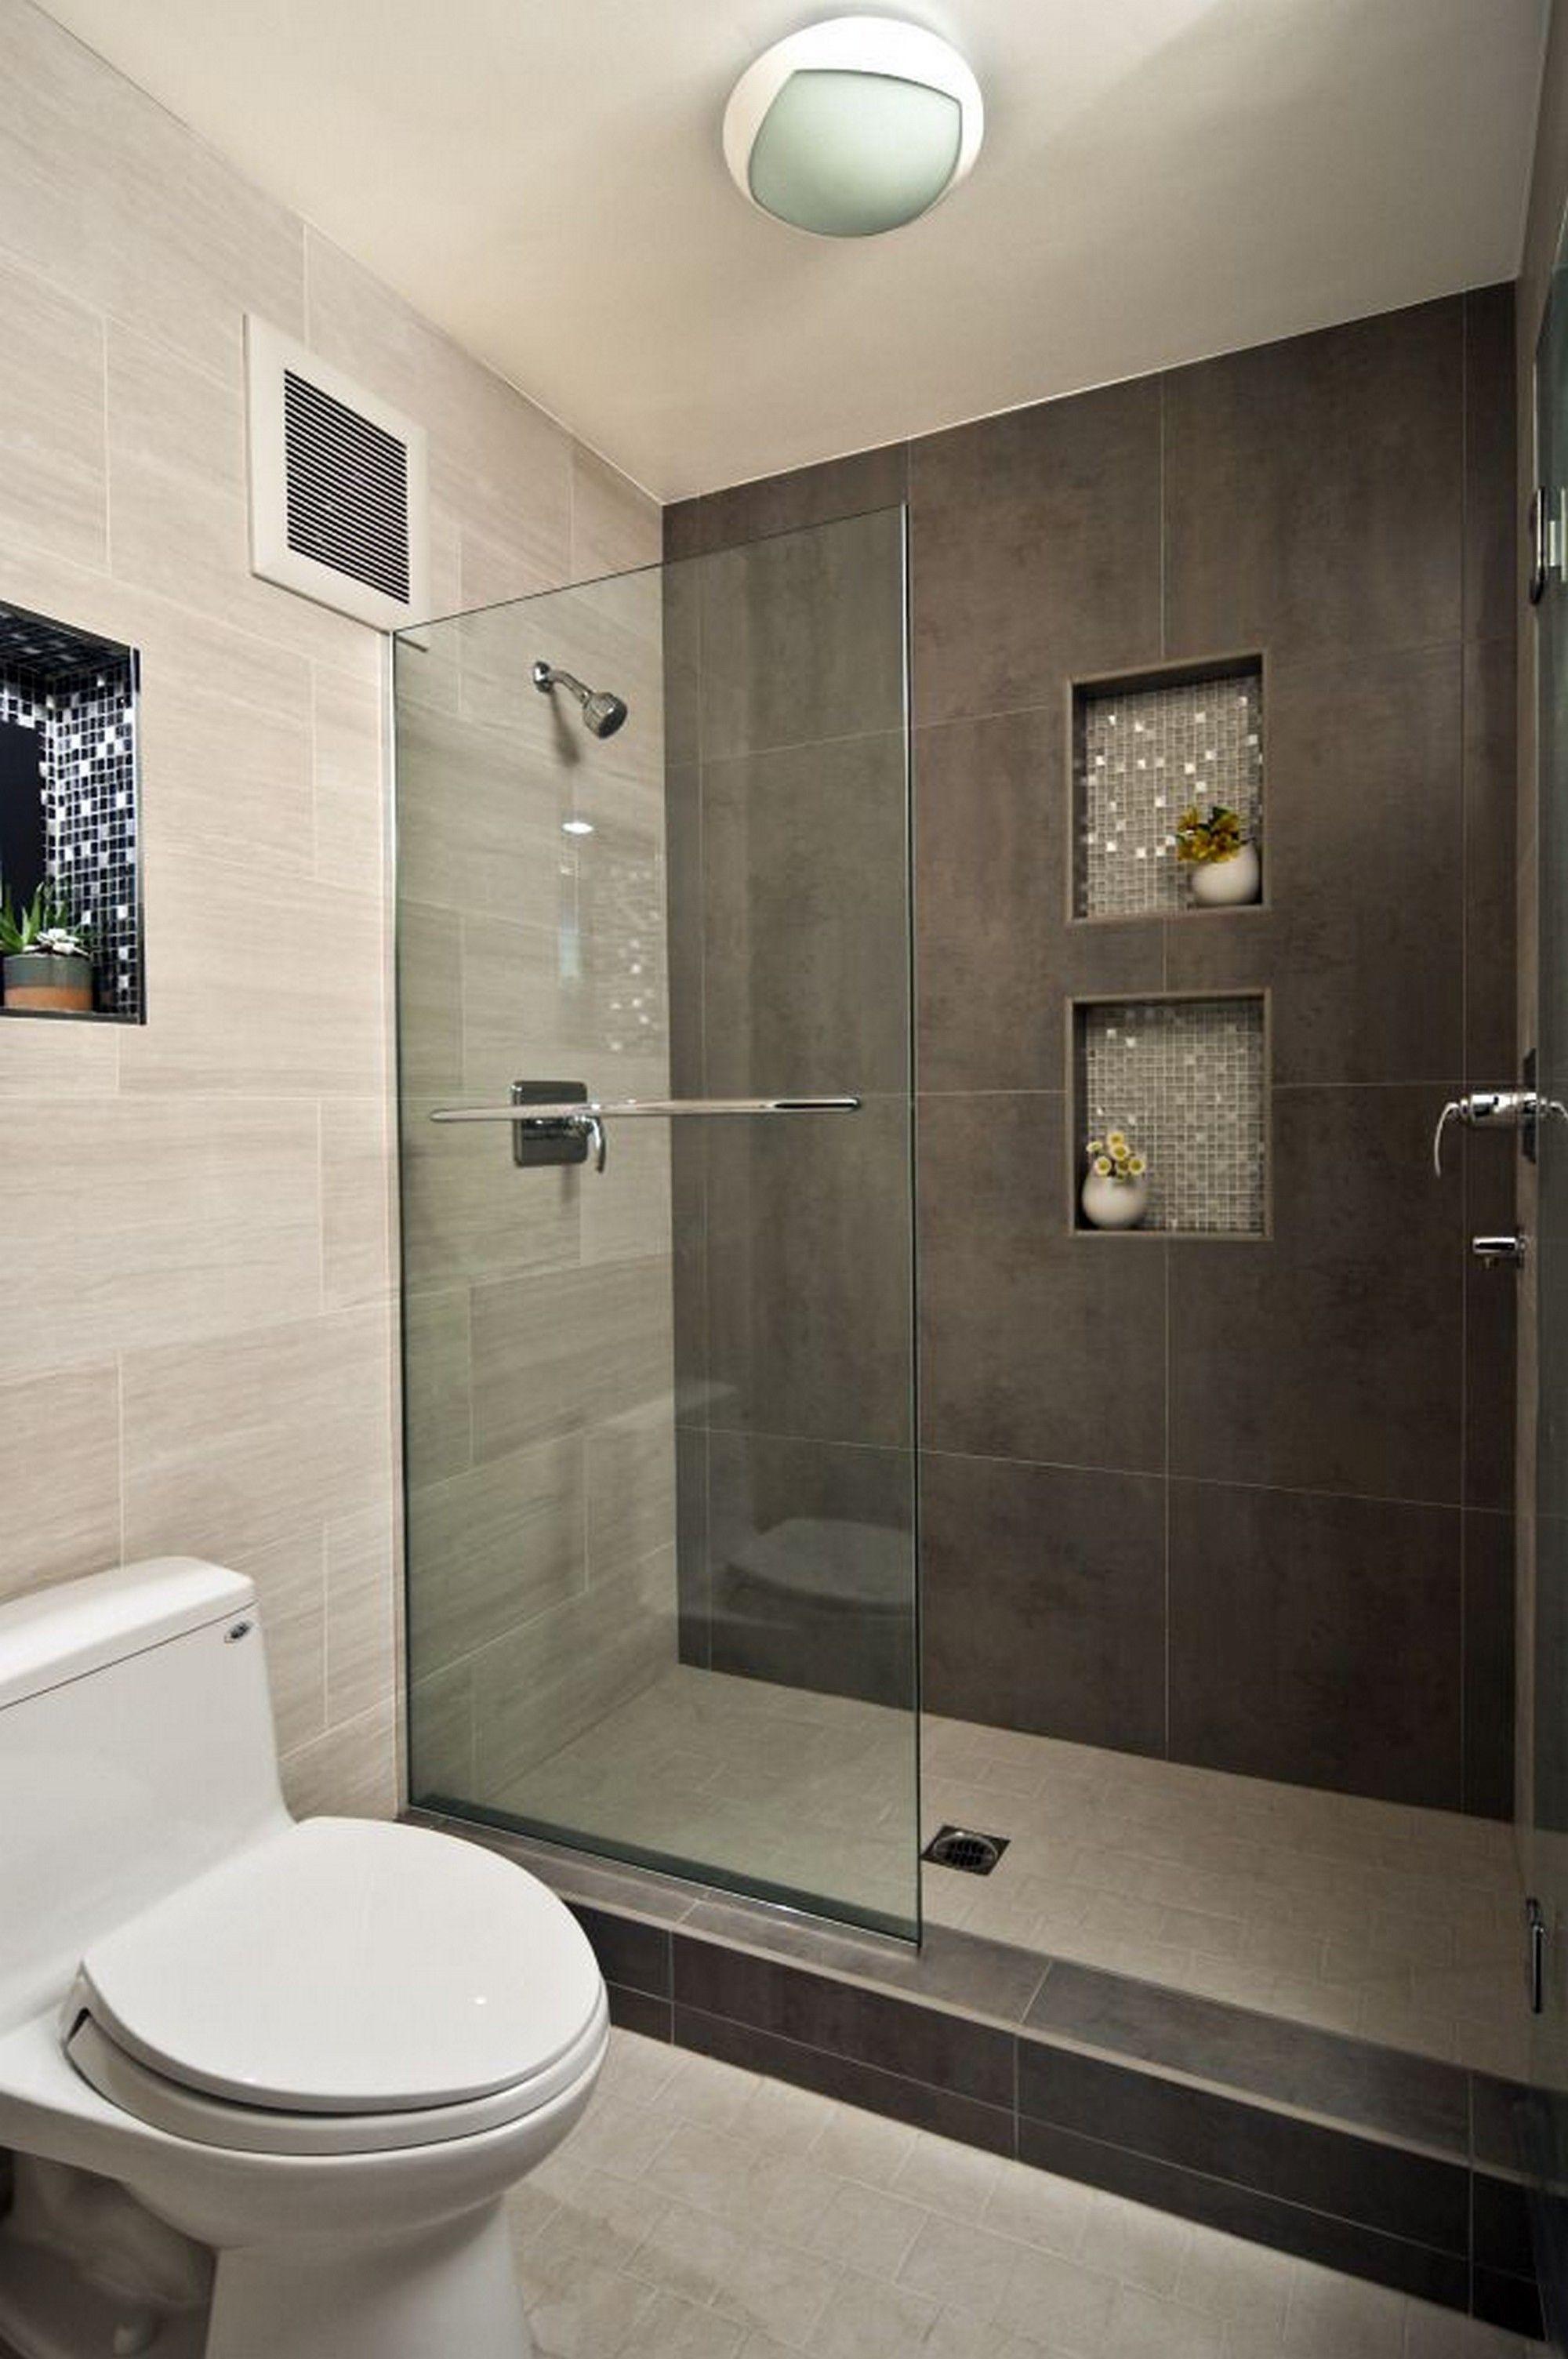 Modern Bathroom Showers Stylish Modern Bathroom Design Ideas with Walk In Shower Architecture